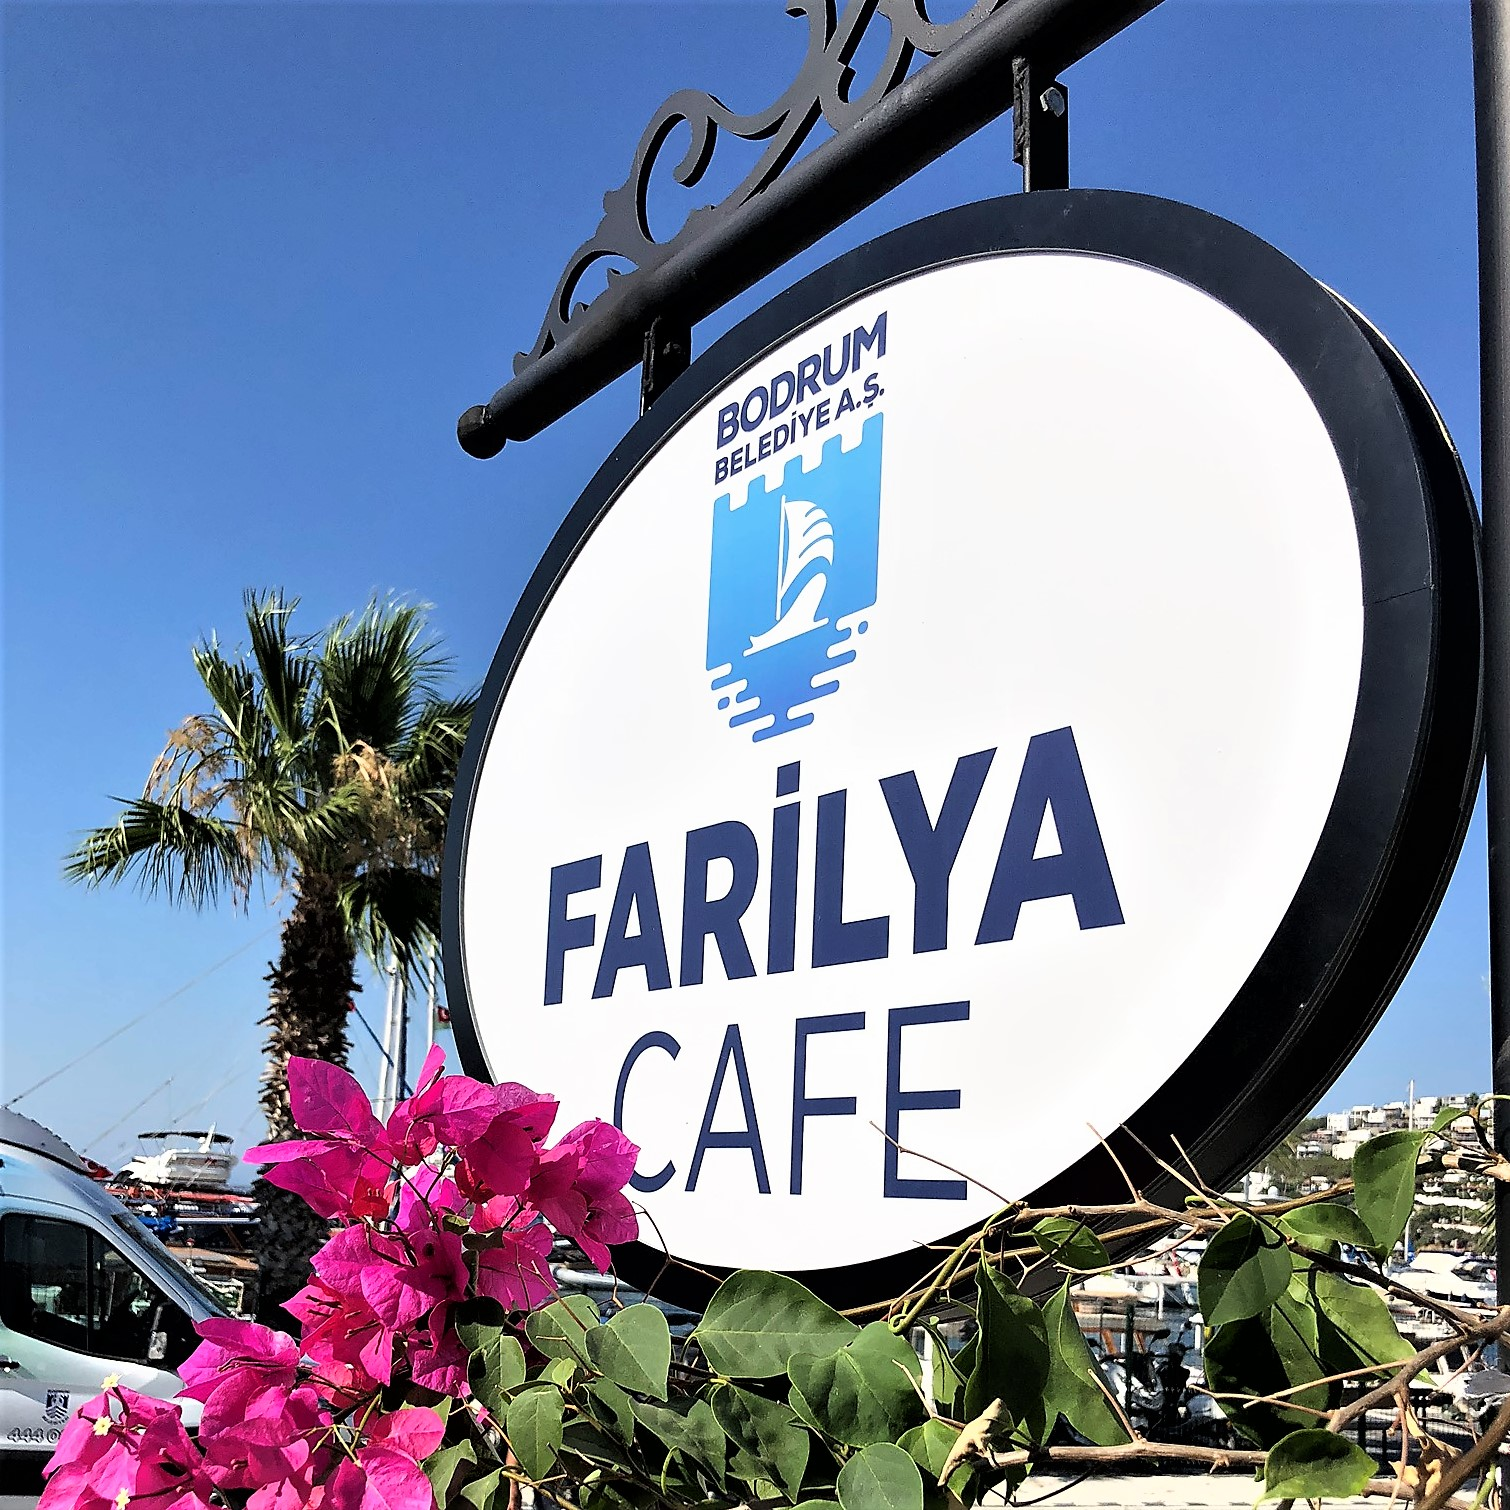 FARİLYA CAFE